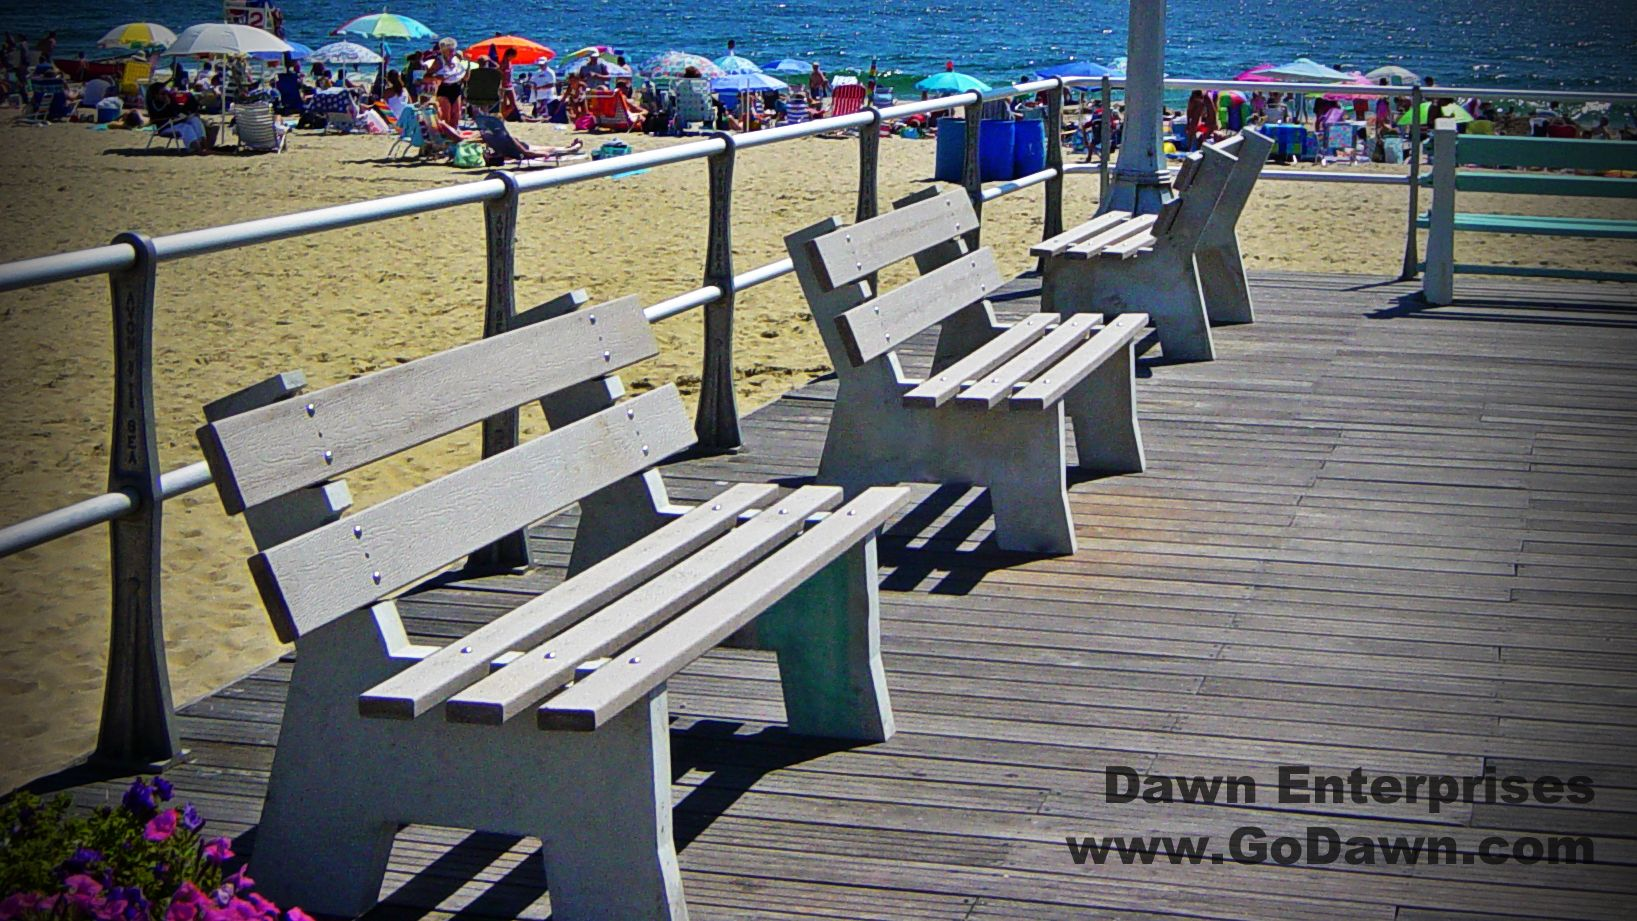 Pleasant Asbury Park Bench Concrete Bench With Wood Slats Concrete Beatyapartments Chair Design Images Beatyapartmentscom